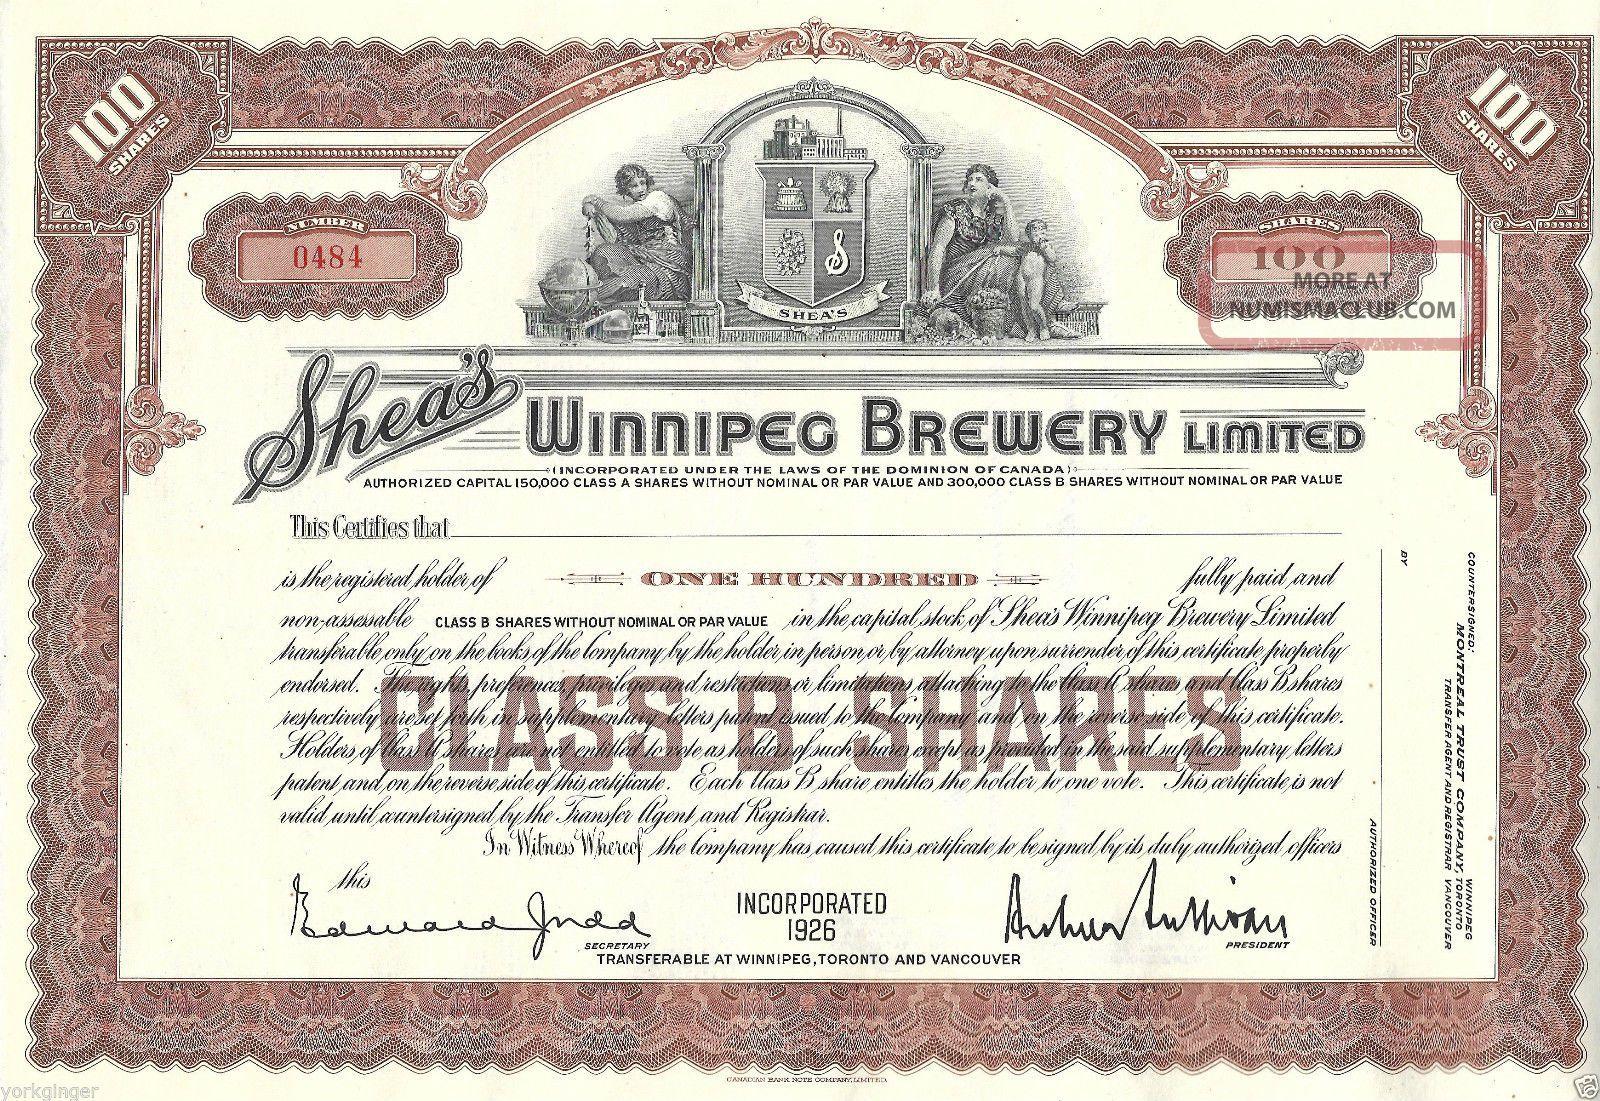 Shea ' S Winnipeg Brewery Ltd.  Canada,  100 Glass B Shares 1926 Stock Certificate Stocks & Bonds, Scripophily photo